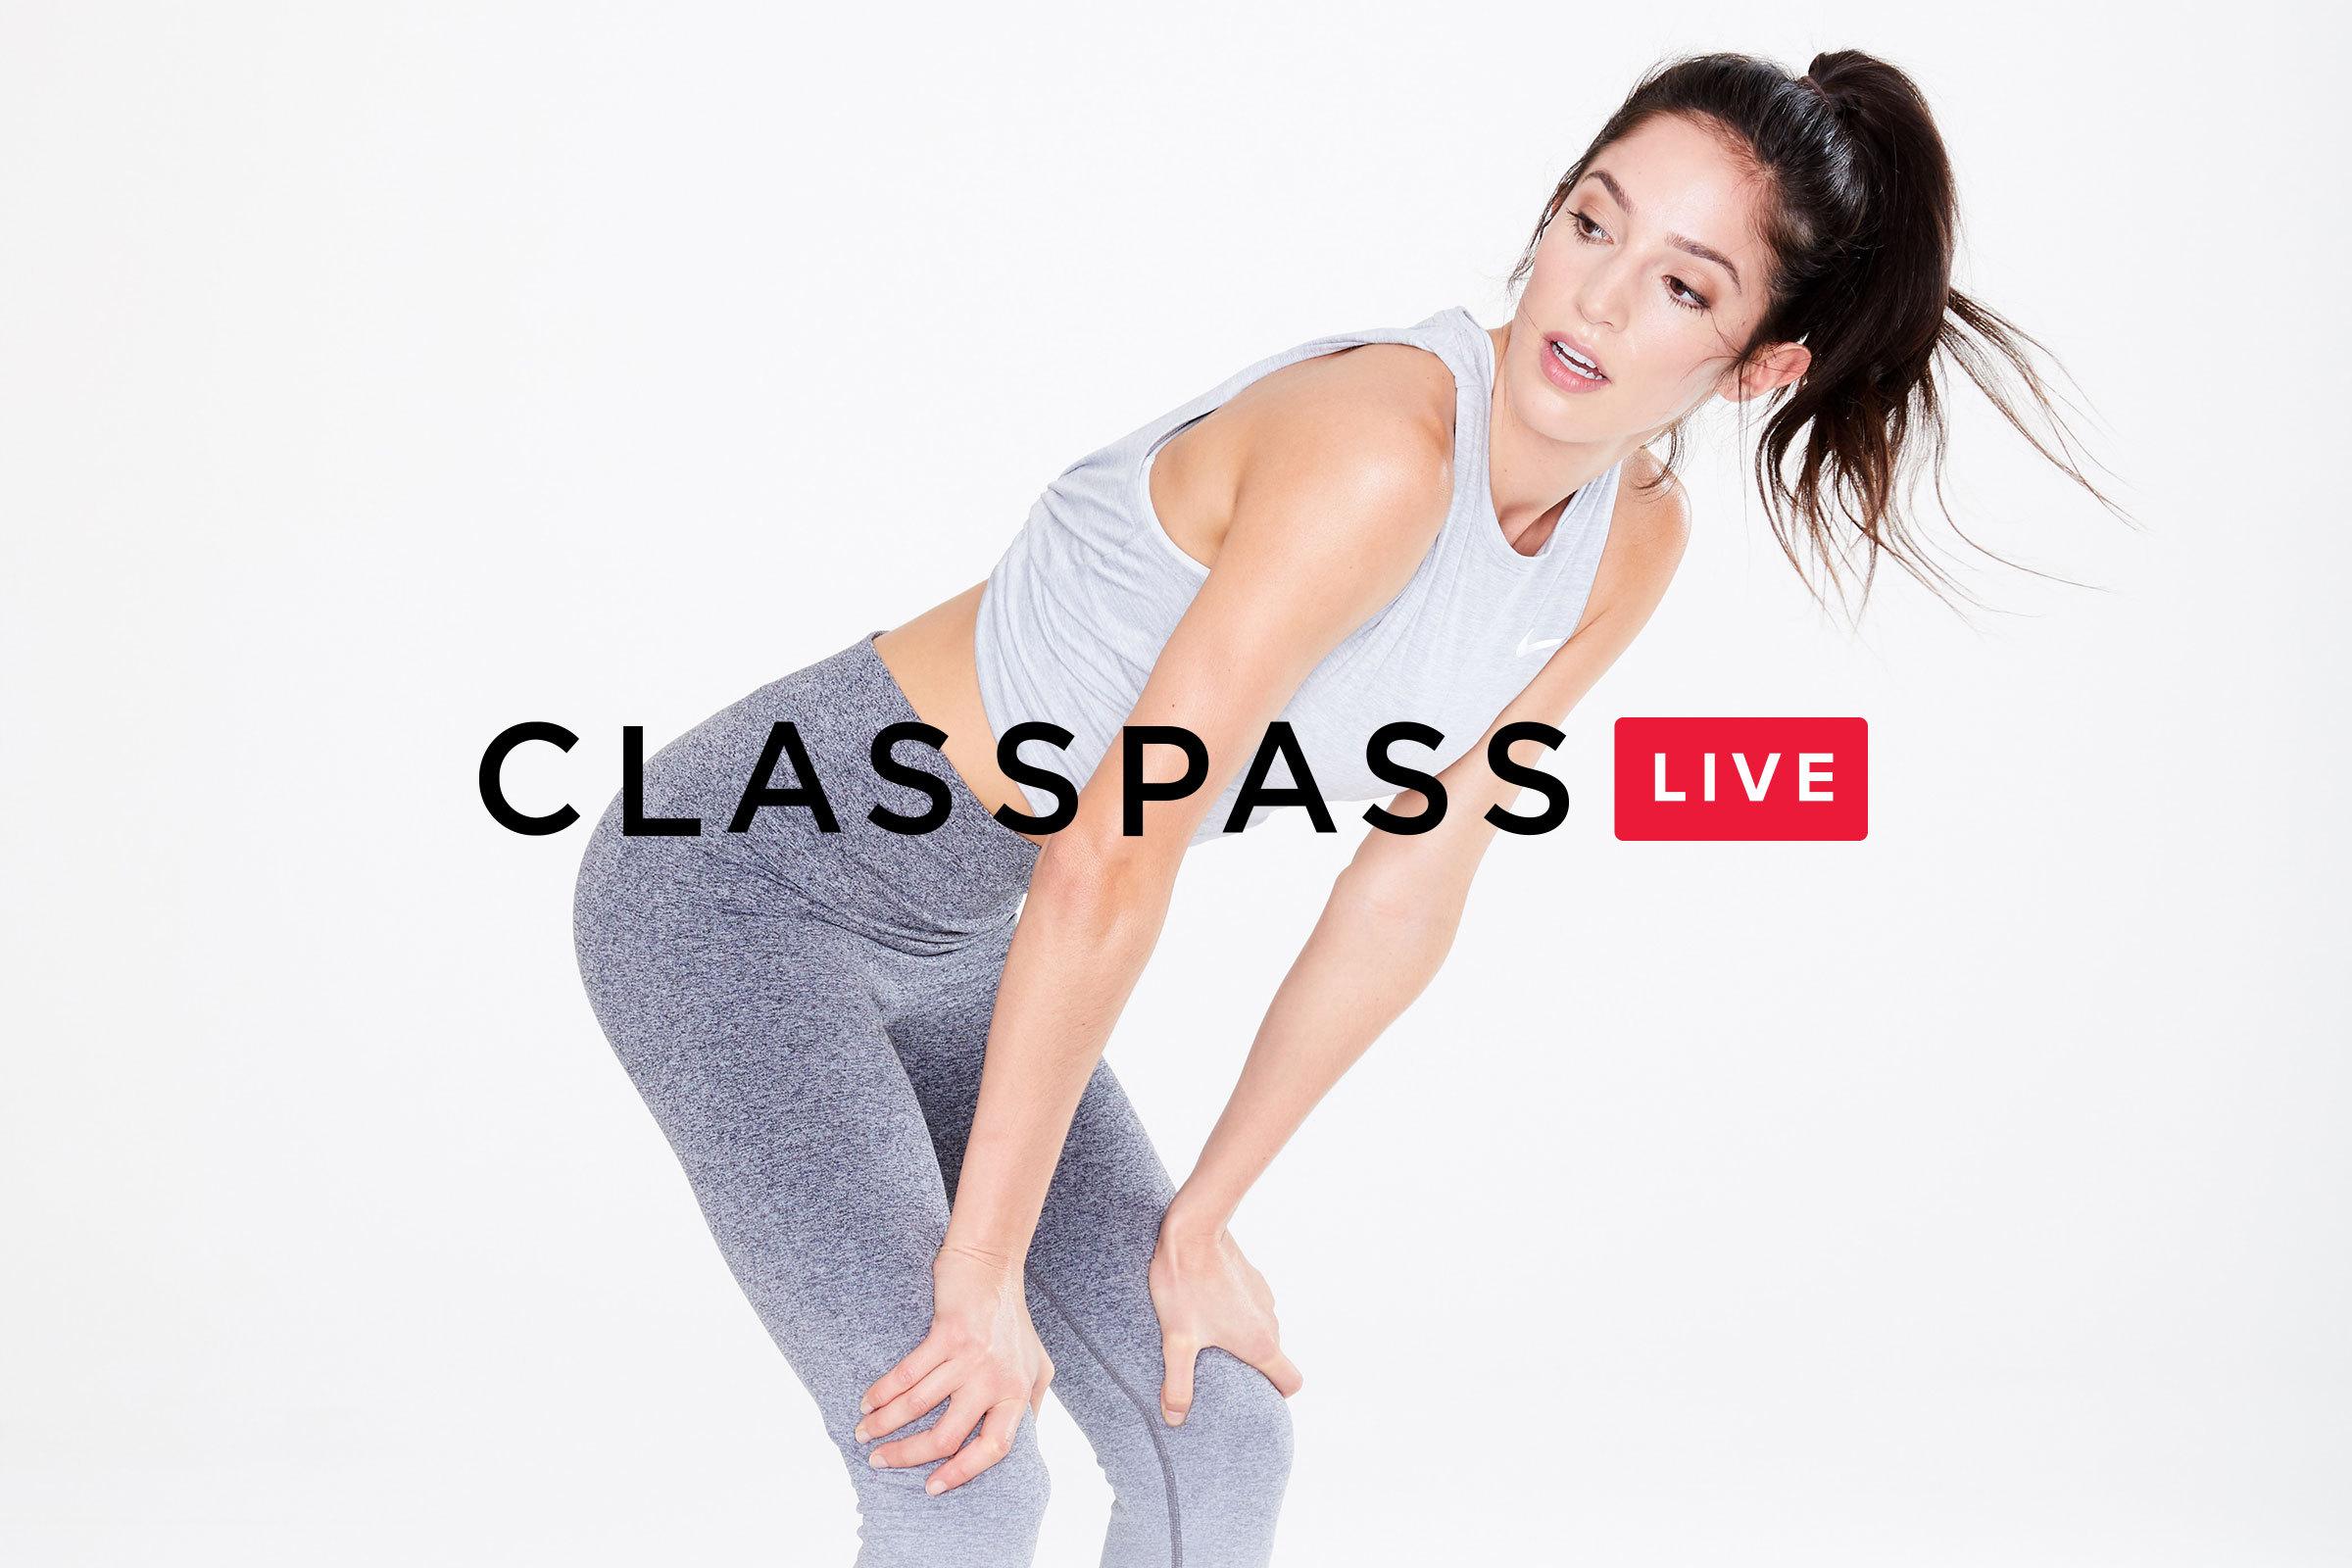 ClassPass Live - Fitness and Technology